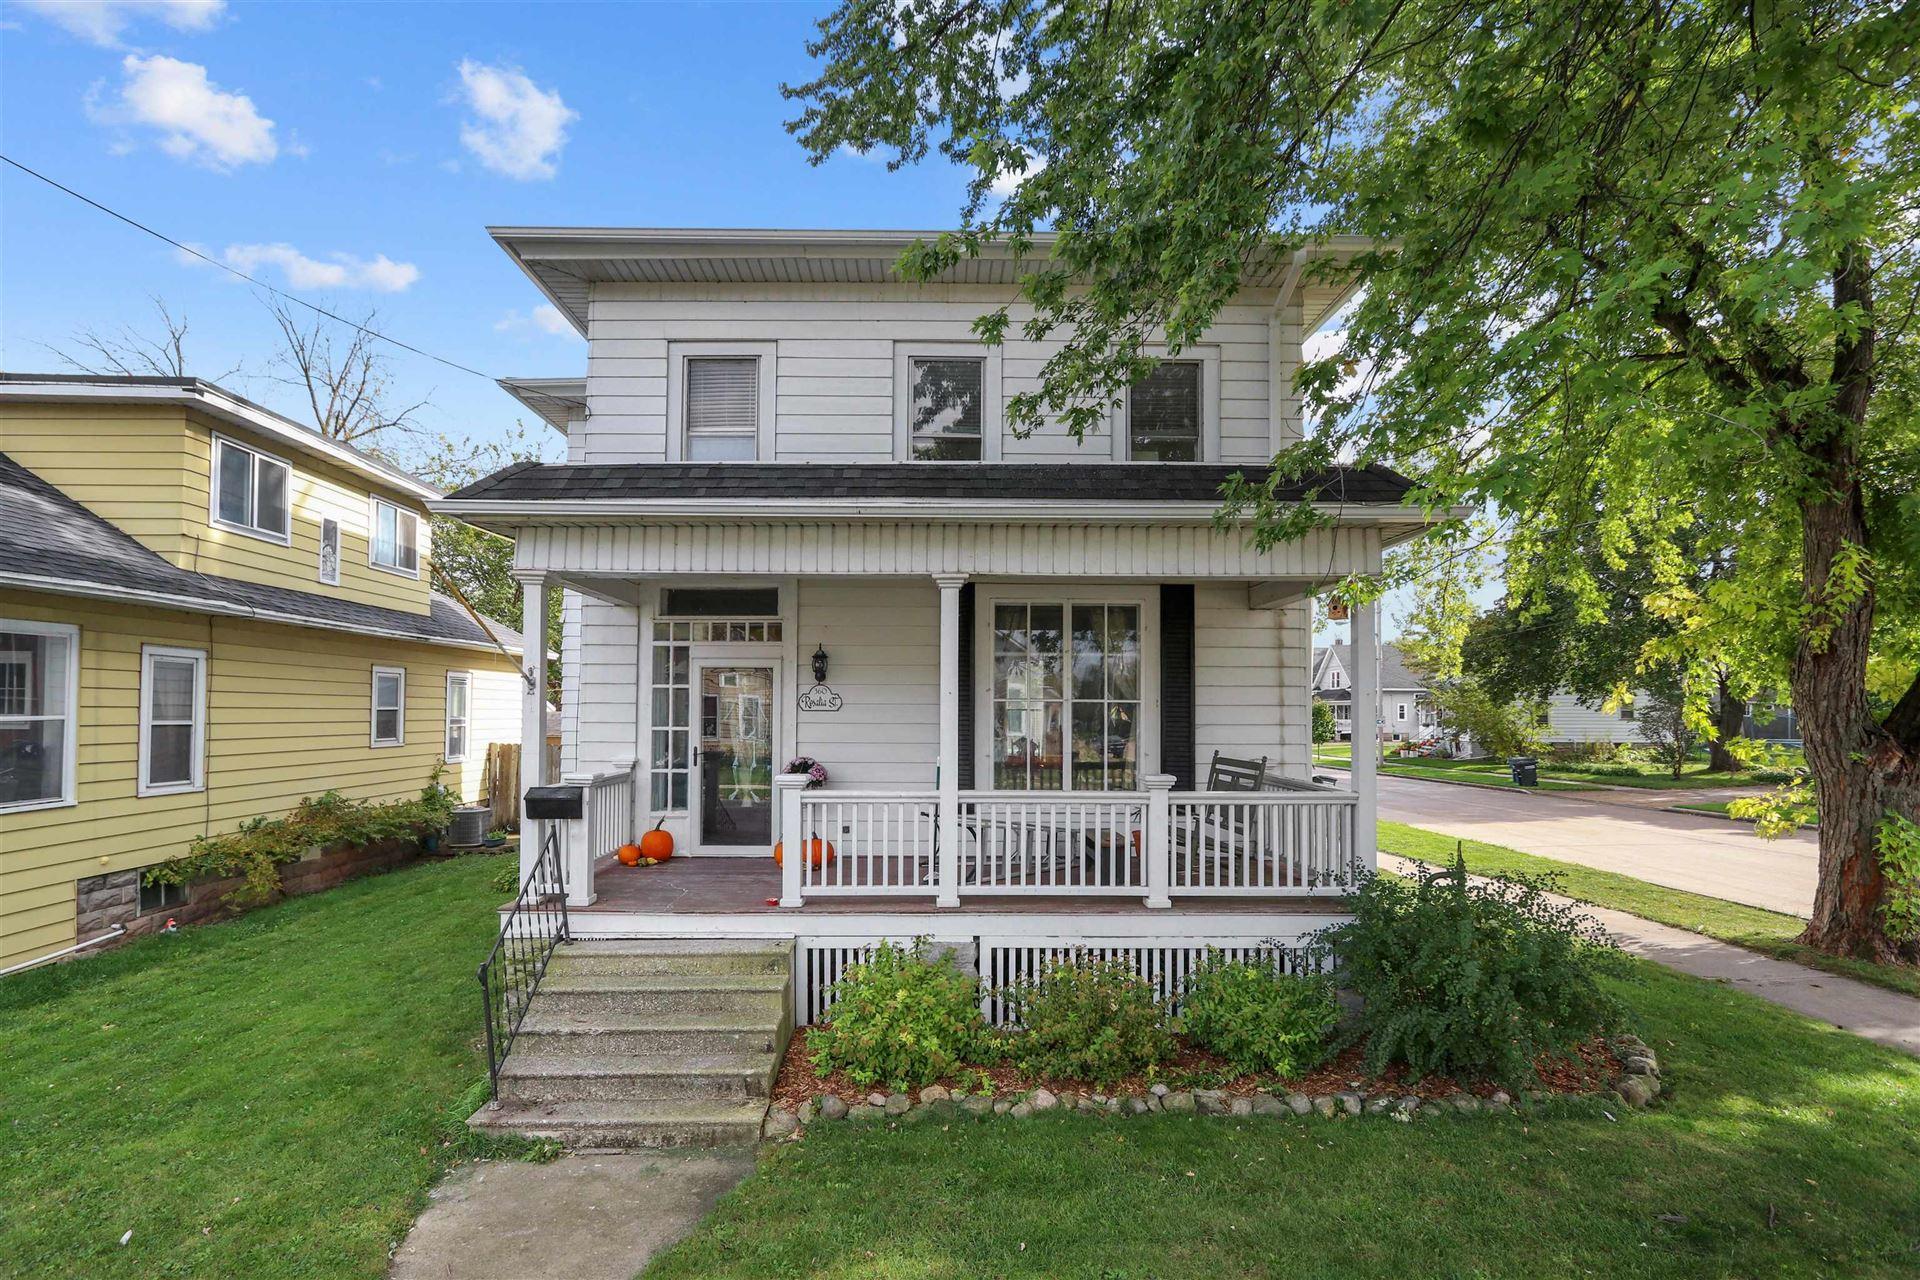 360 ROSALIA Street, Oshkosh, WI 54901 - MLS#: 50250047